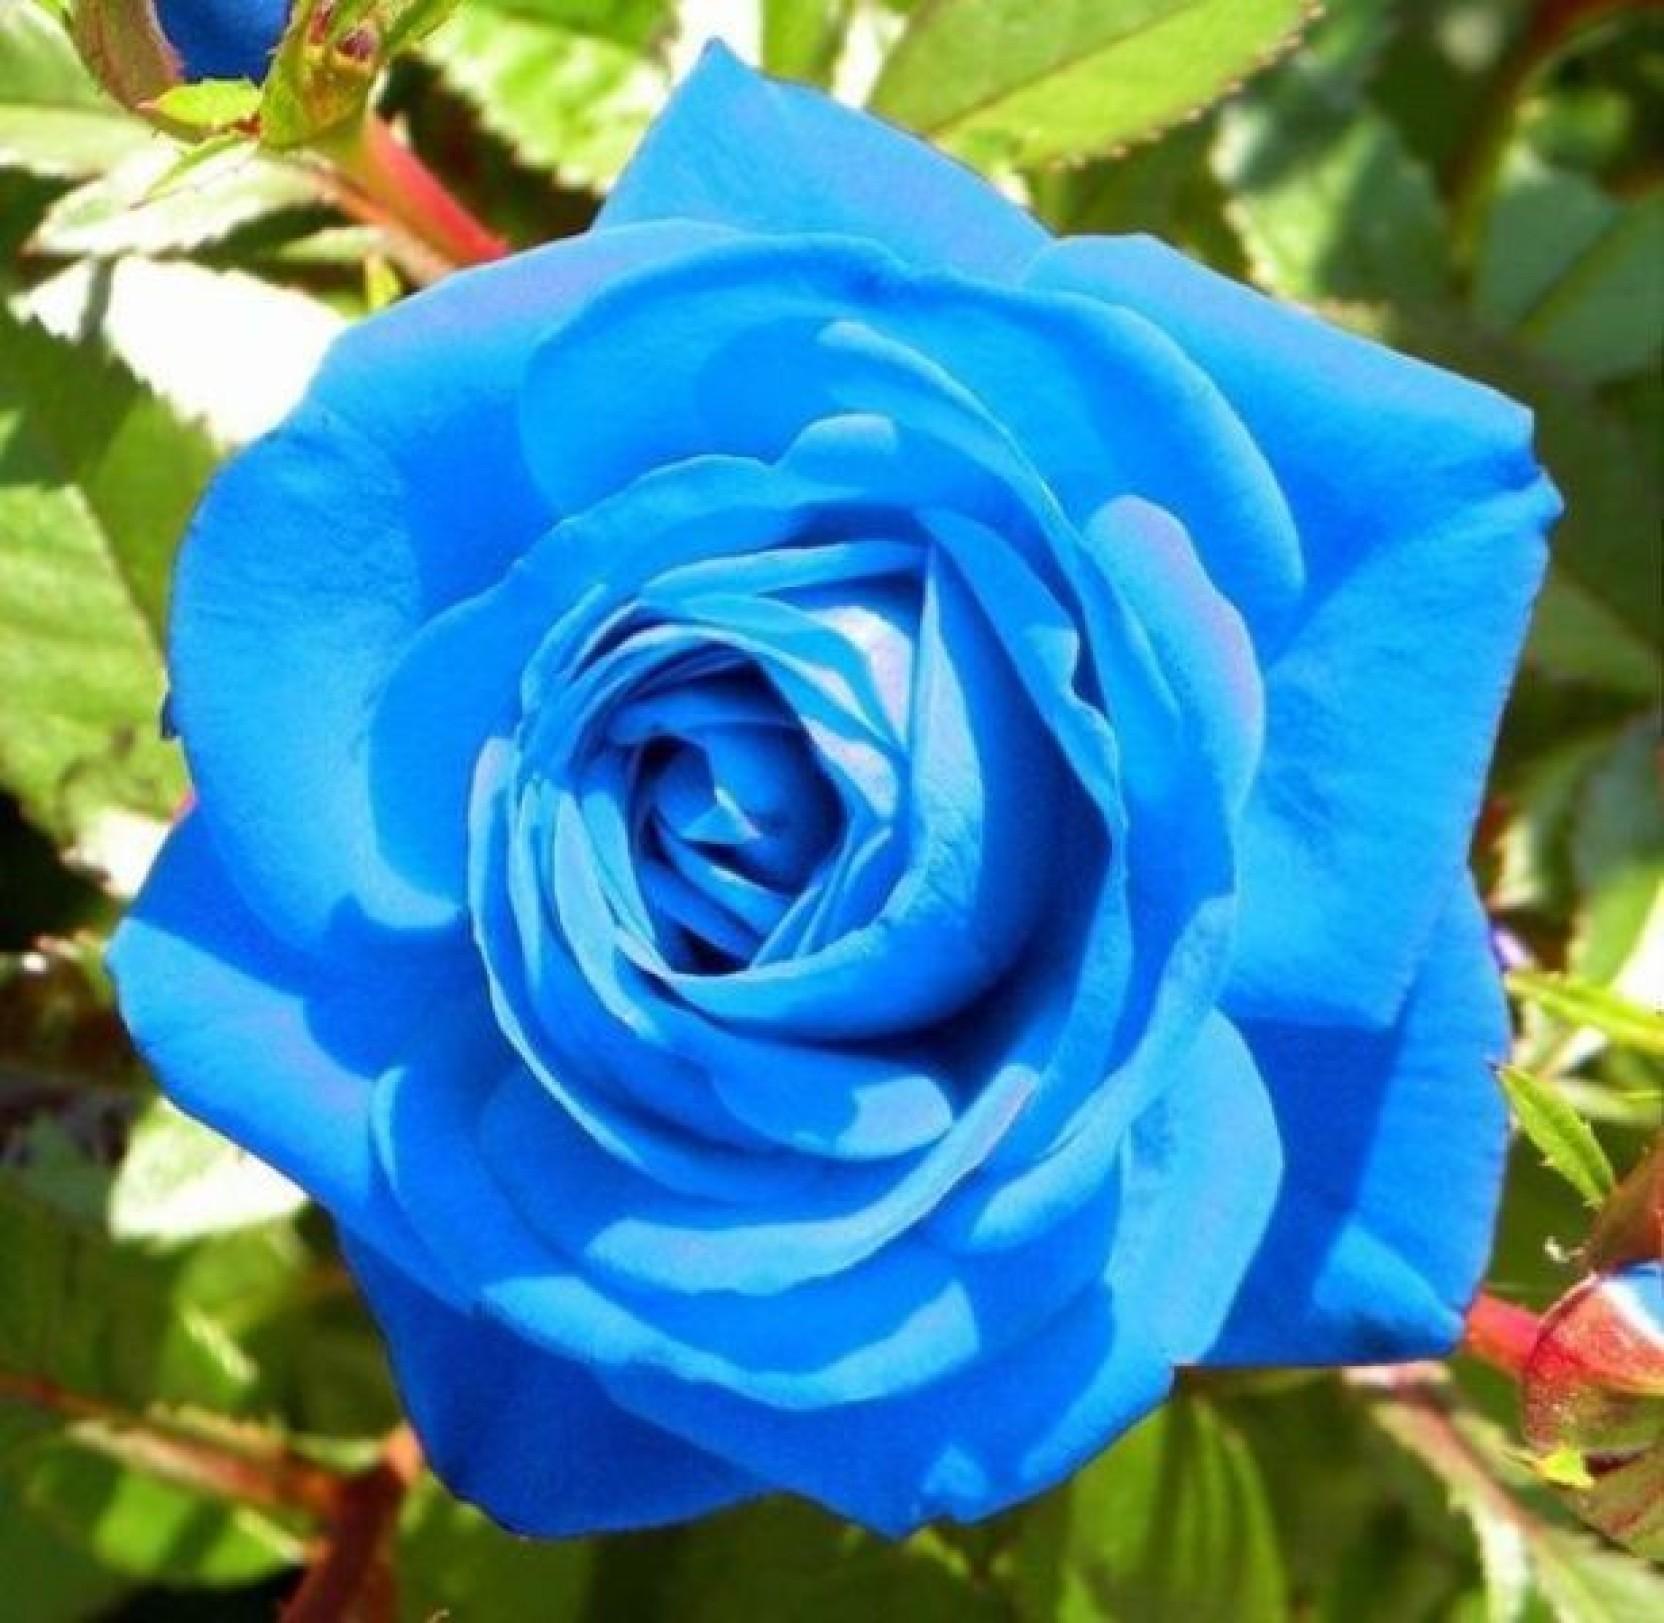 Rosemerc Rose Seed Price In India Buy Rosemerc Rose Seed Online At